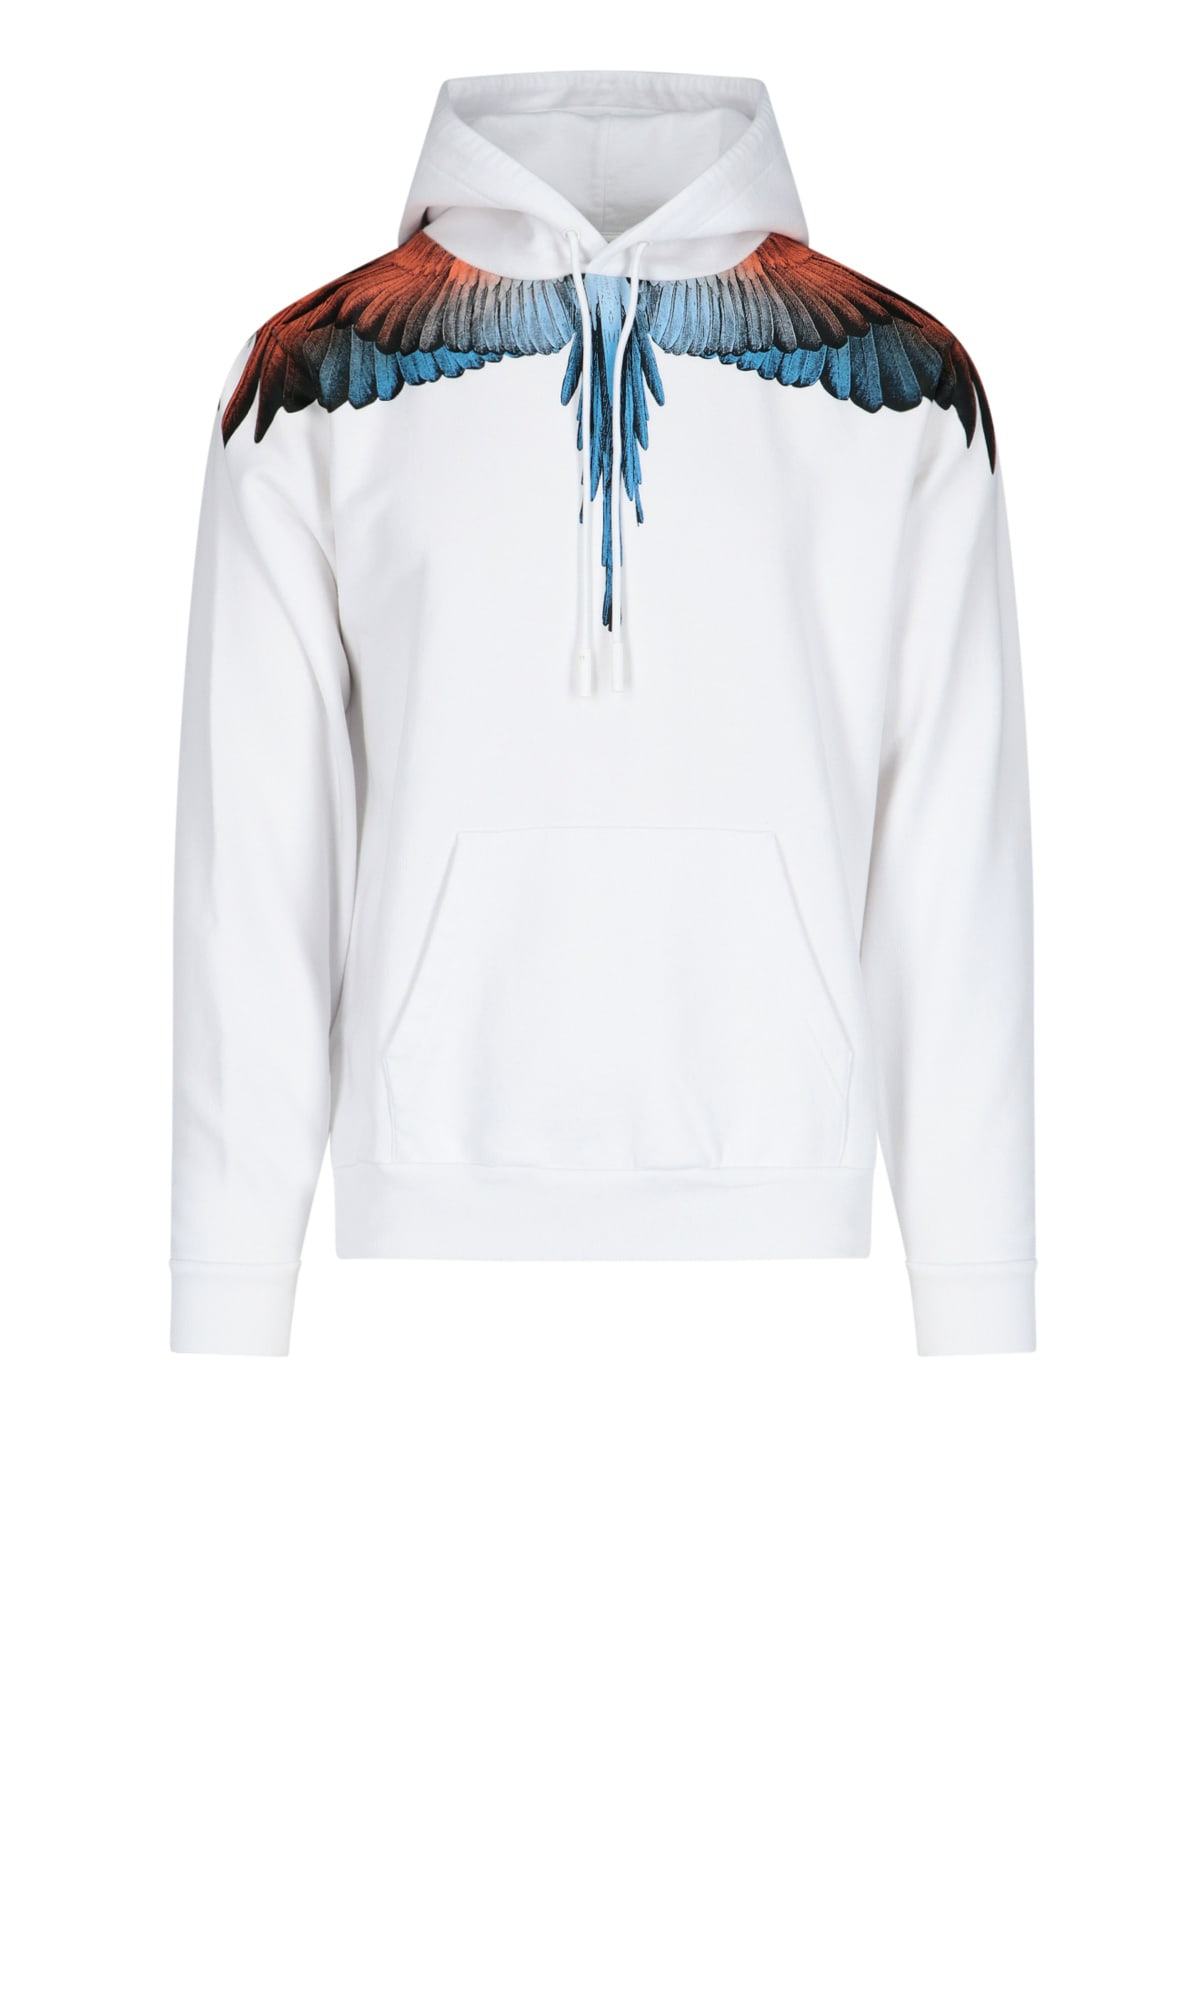 Marcelo Burlon County Of Milan Sweatshirts SWEATER